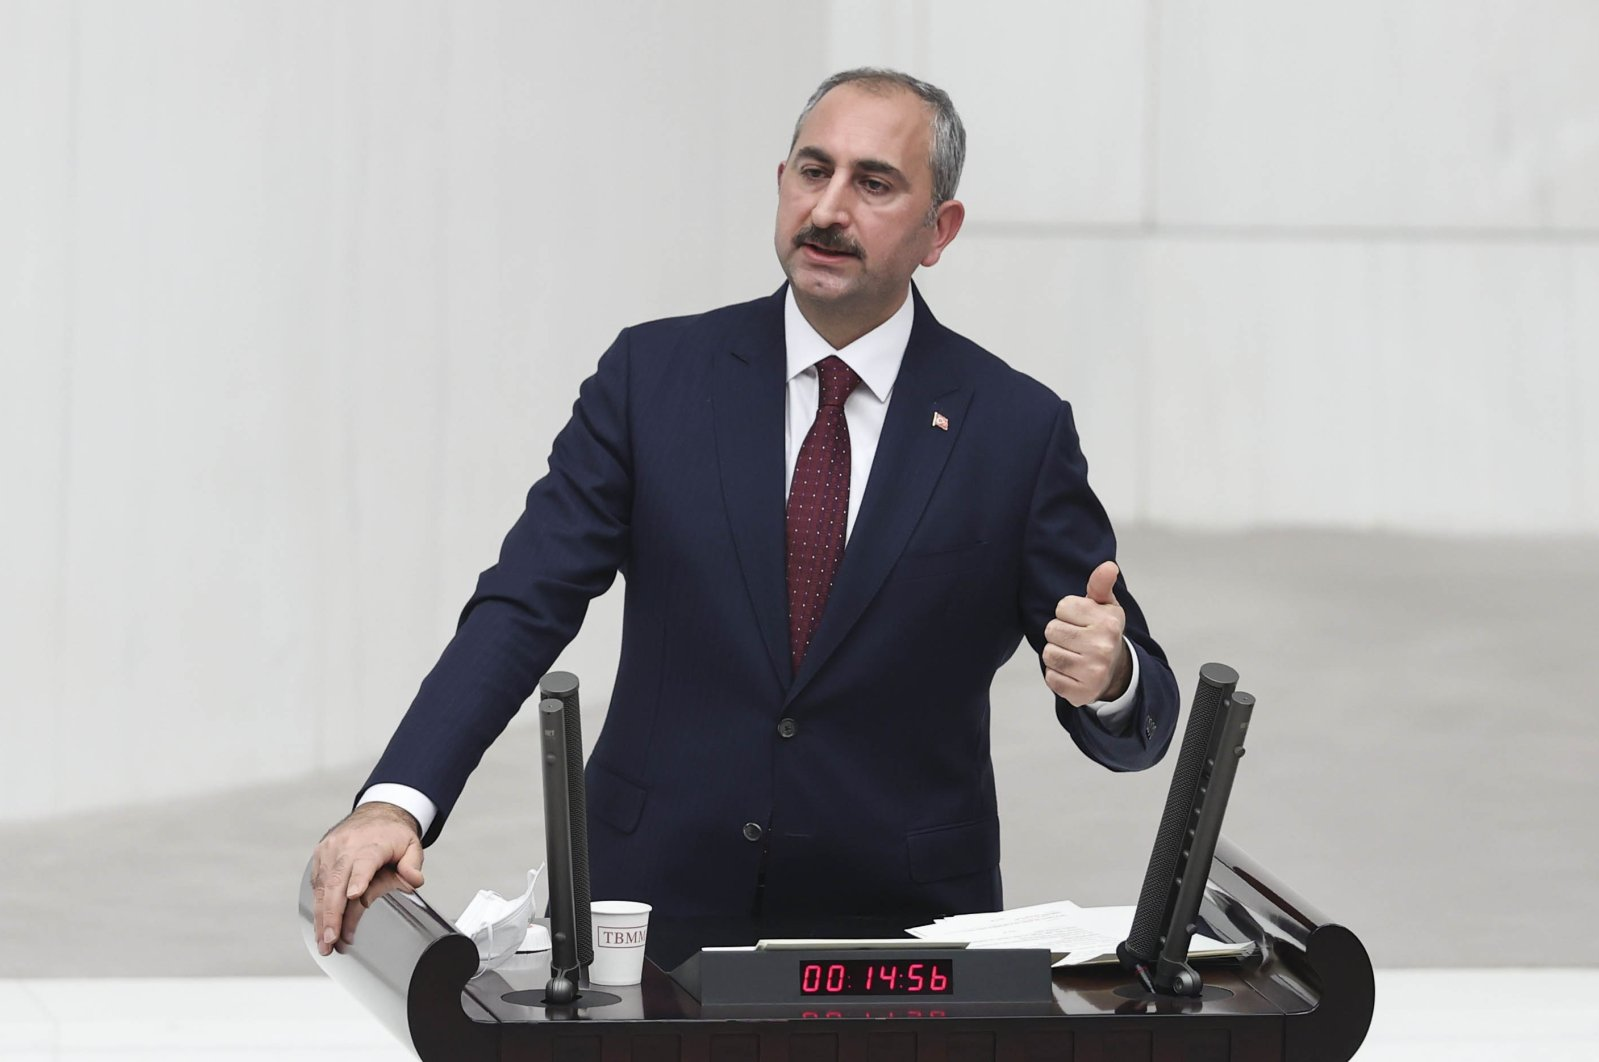 Justice Minister Abdulhamit Gül speaks during the 2021 budget debates in Parliament in Ankara, Turkey, Dec. 9, 2020. (AA Photo)